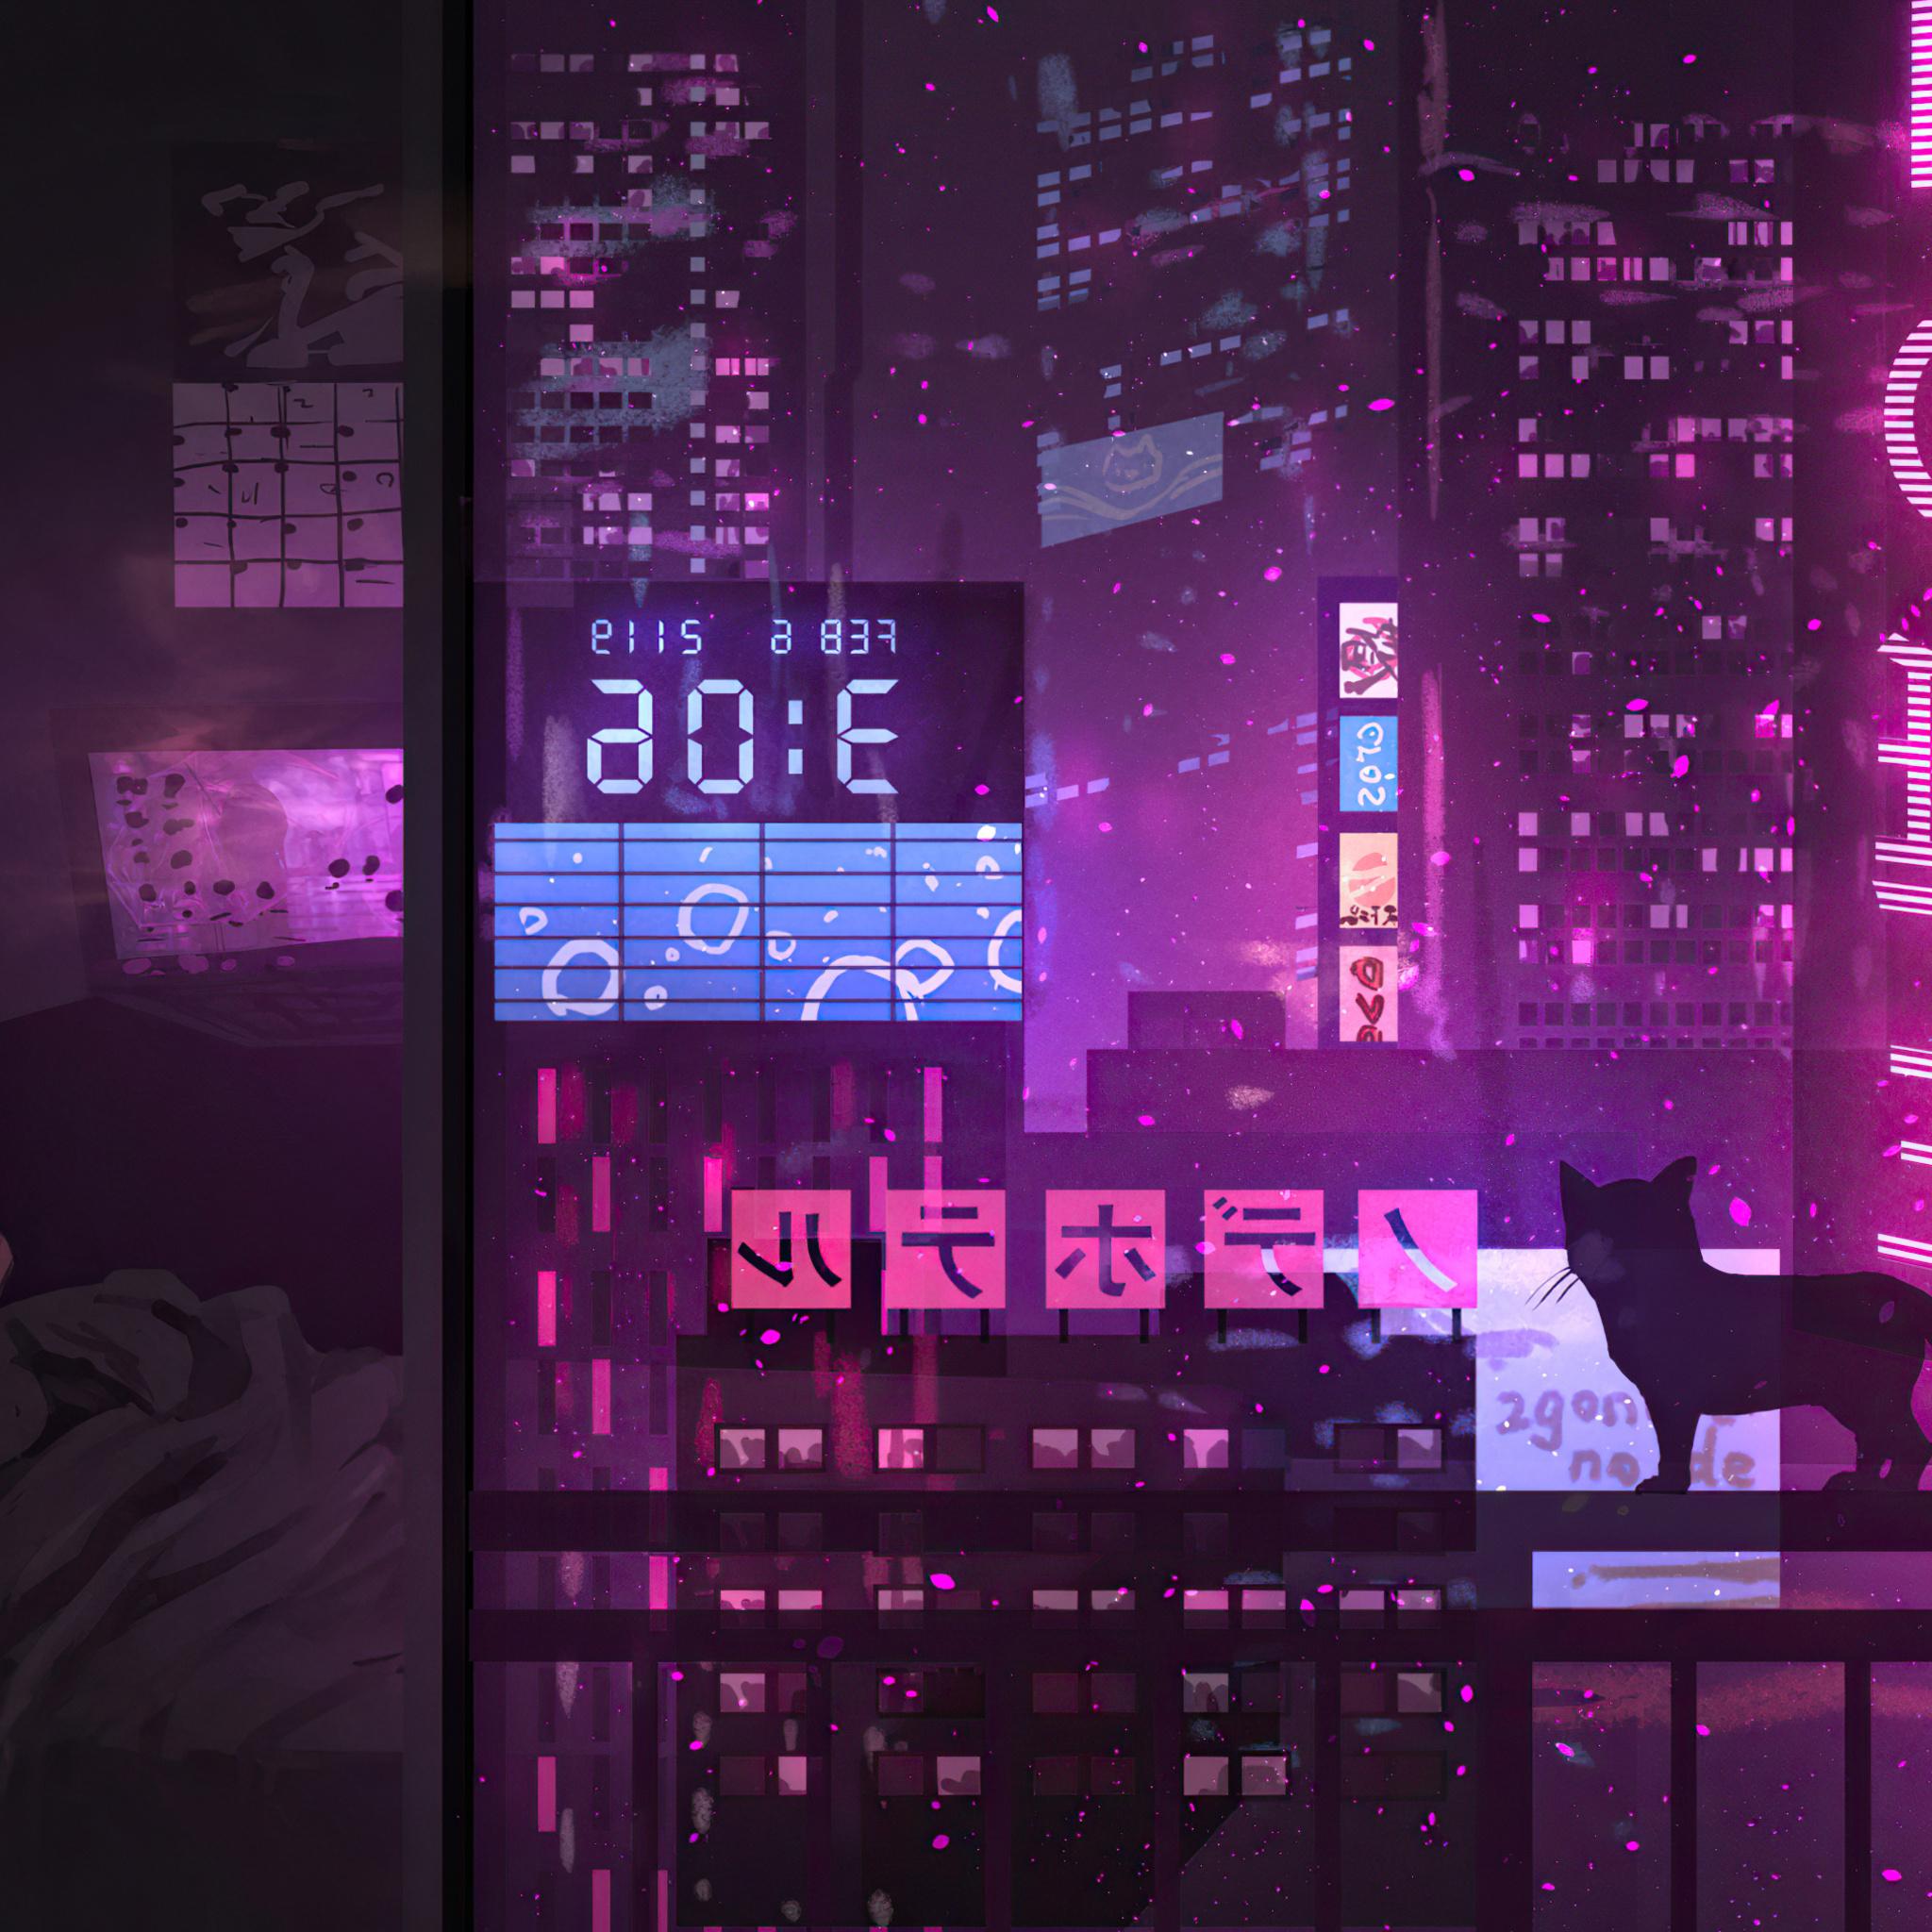 anime-girl-city-night-neon-cyberpunk-4k-kw.jpg